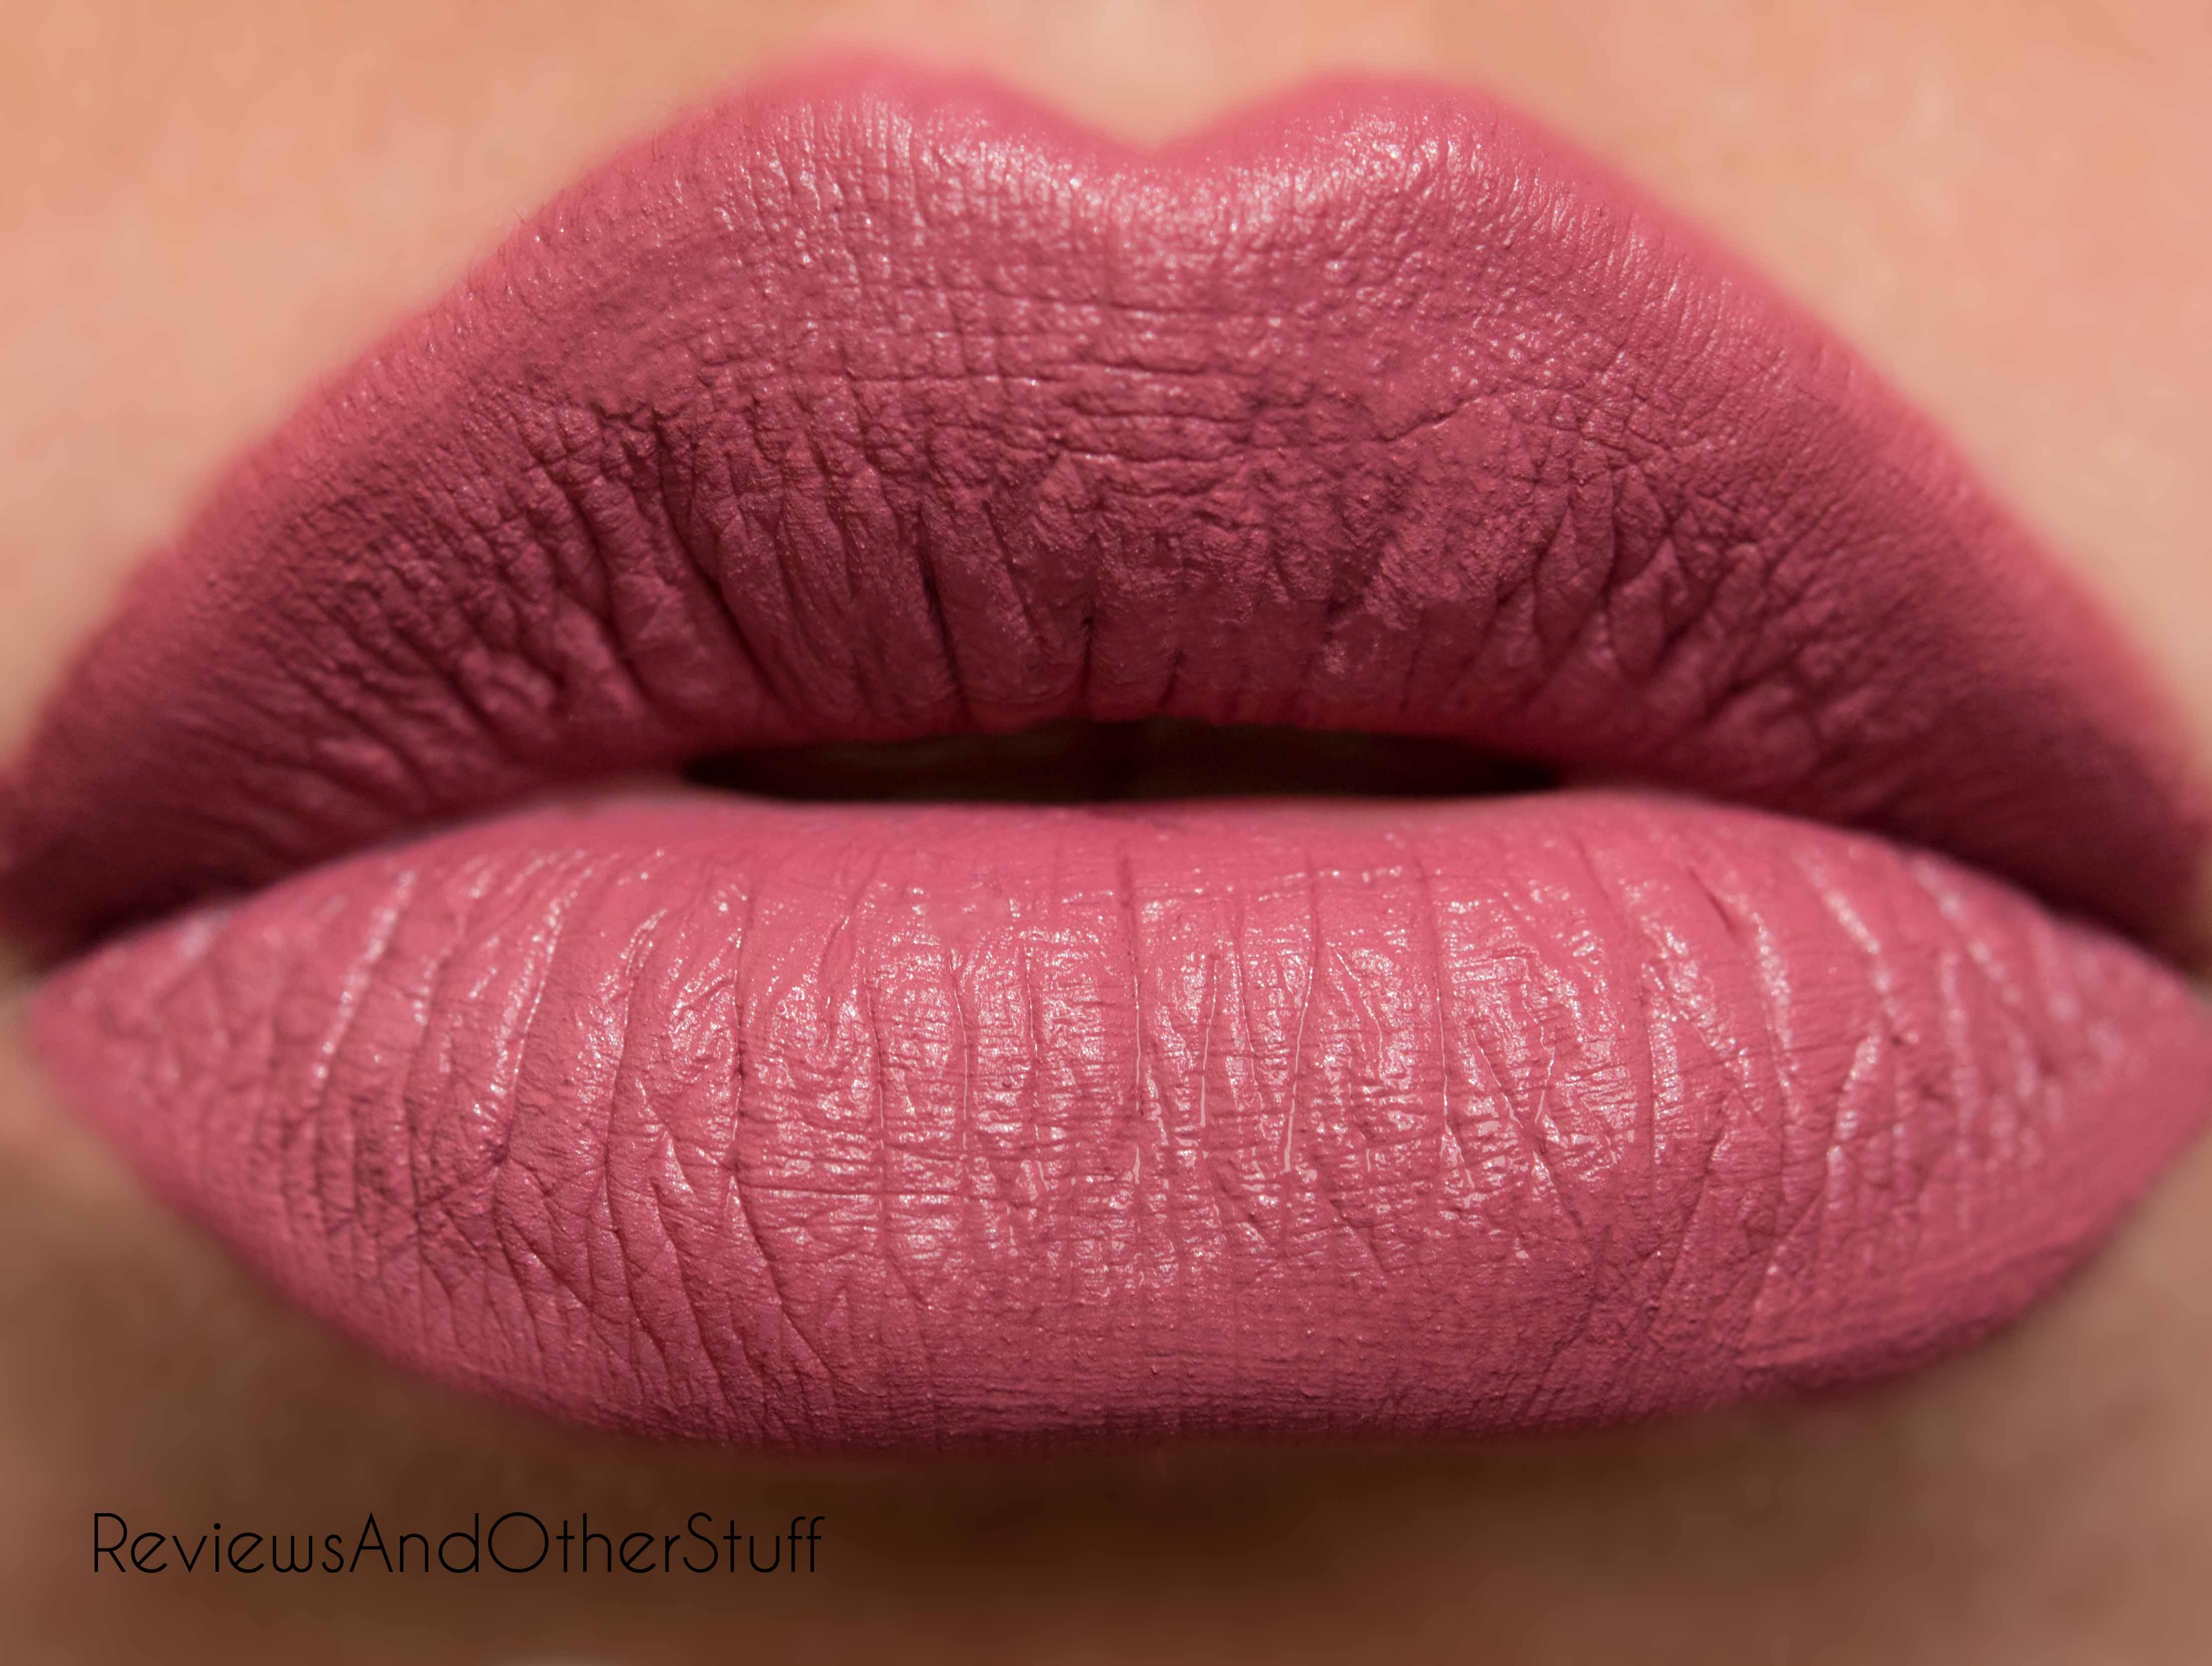 Tarte tarteist creamy matte lip paint review for Tarte lip paint fomo